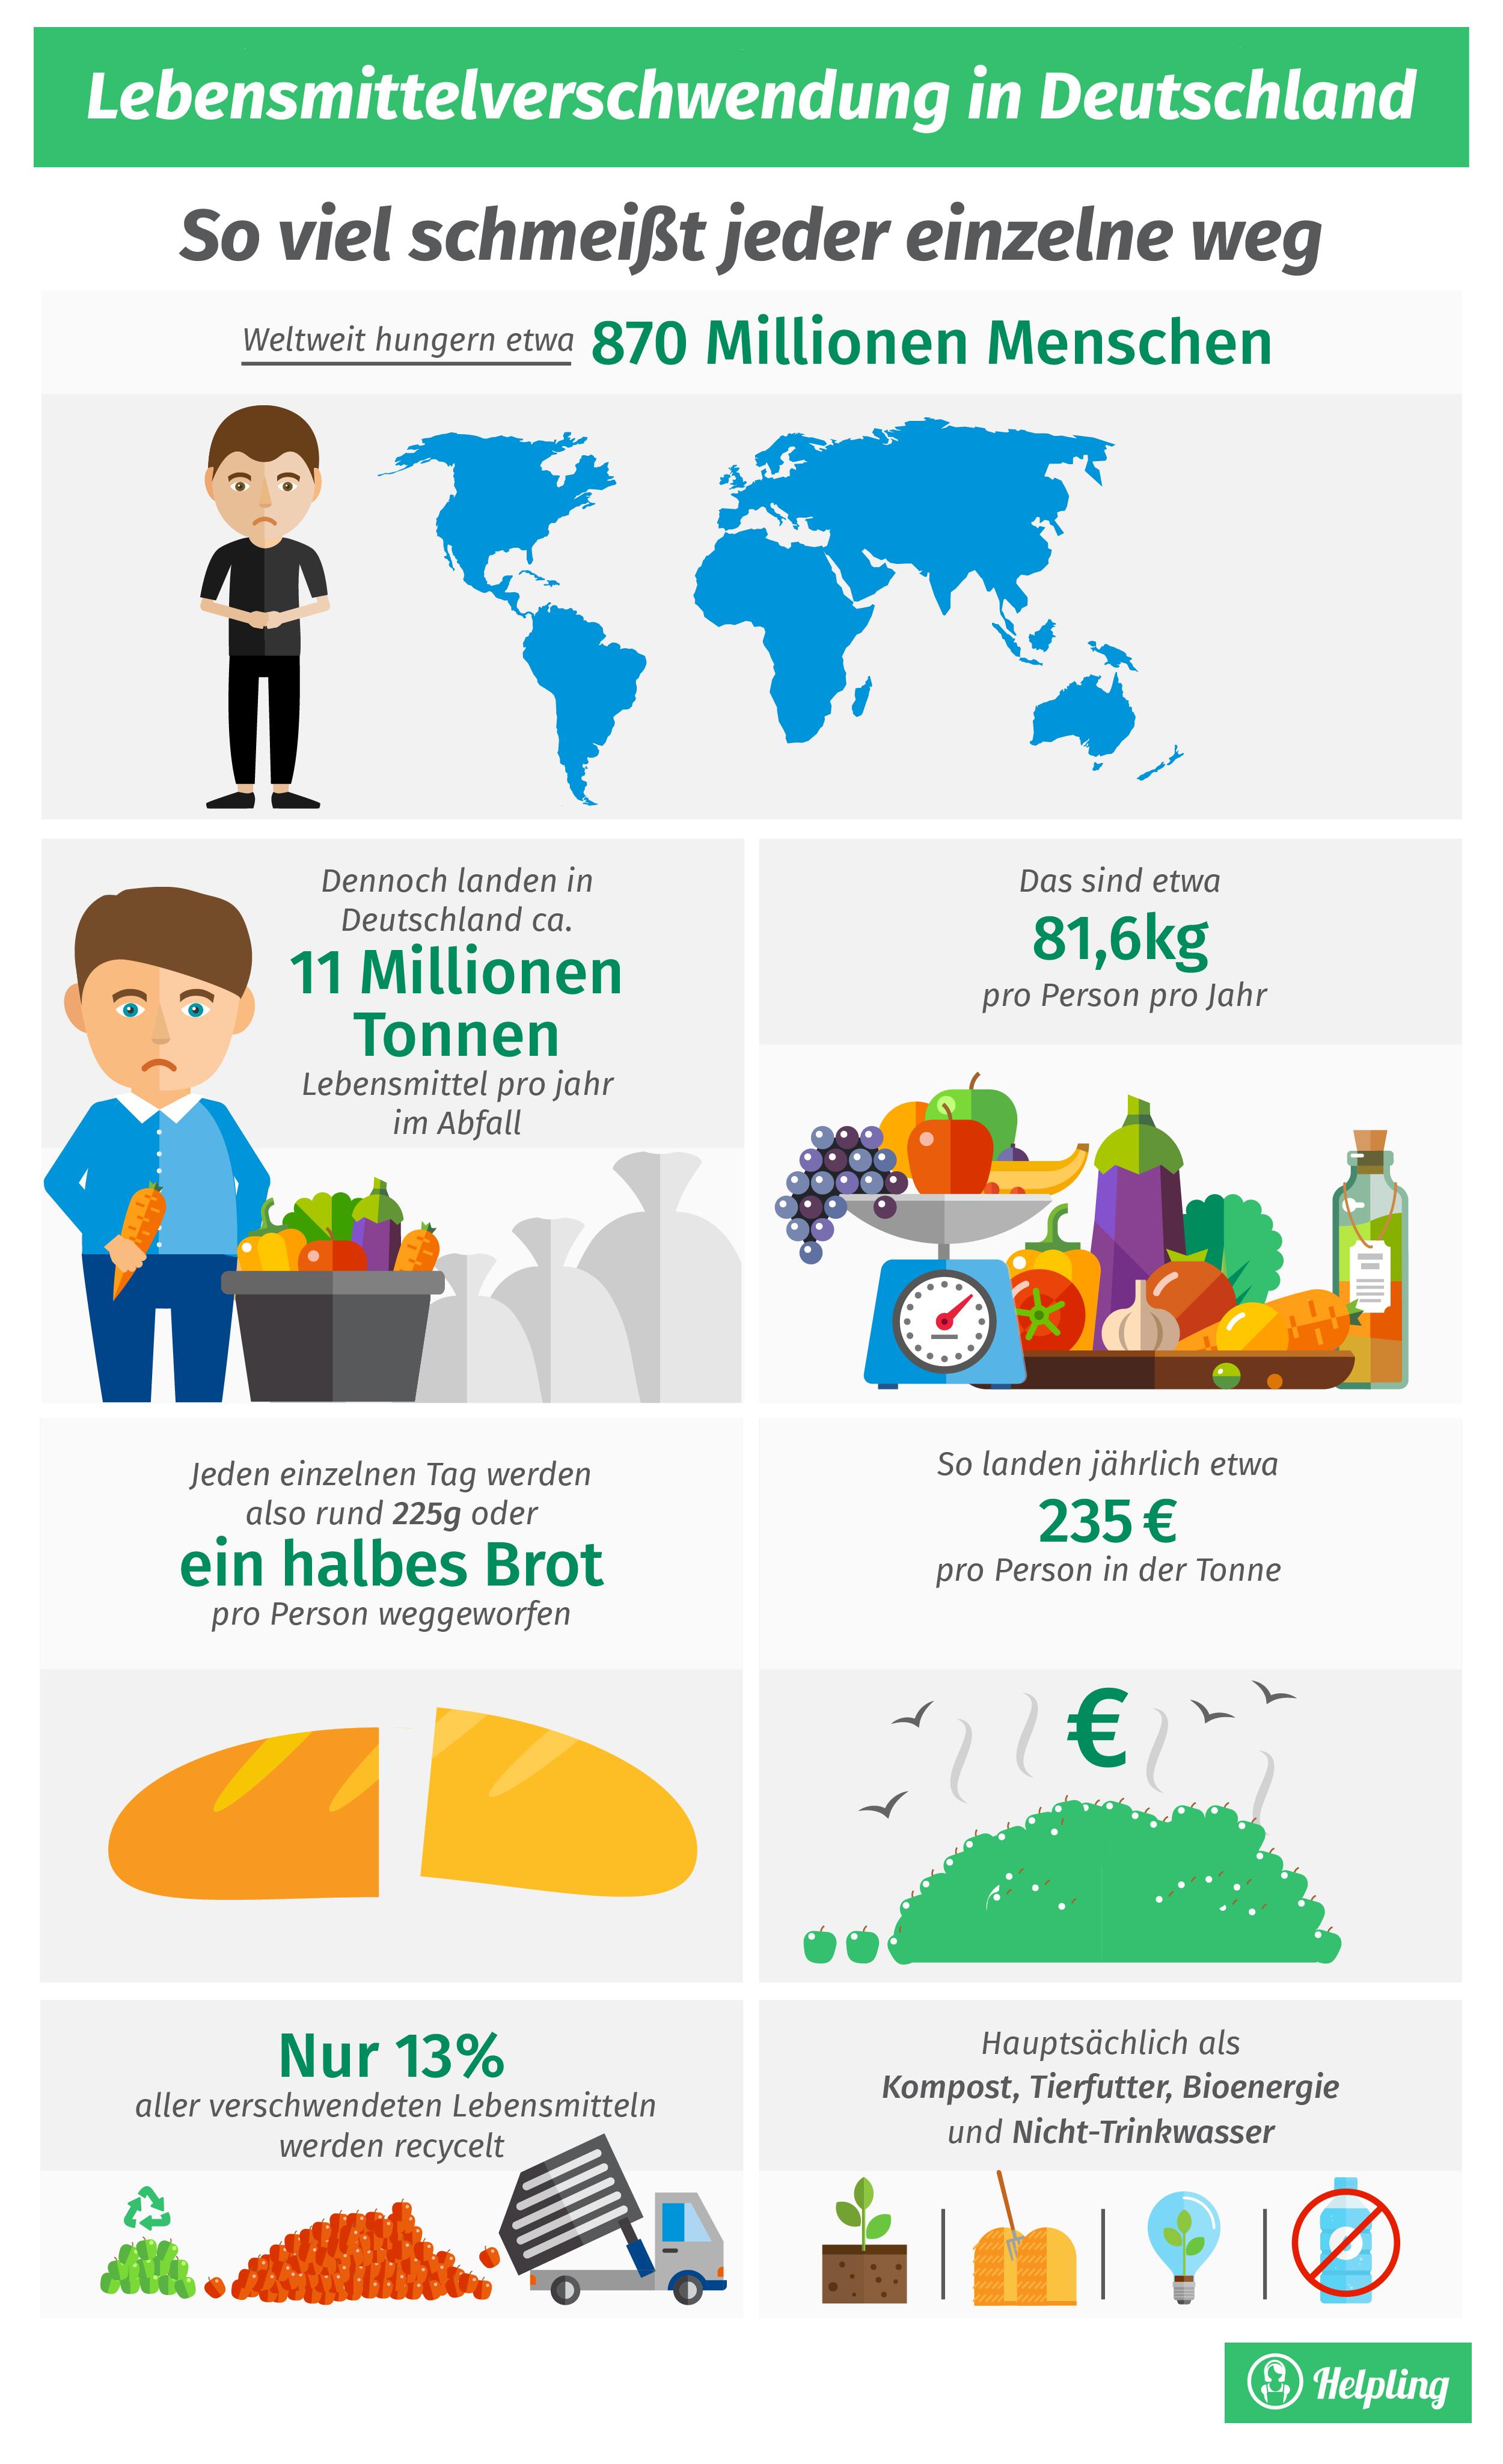 Welternährungstag, Welthungertag, Lebensmittelverschwendung,